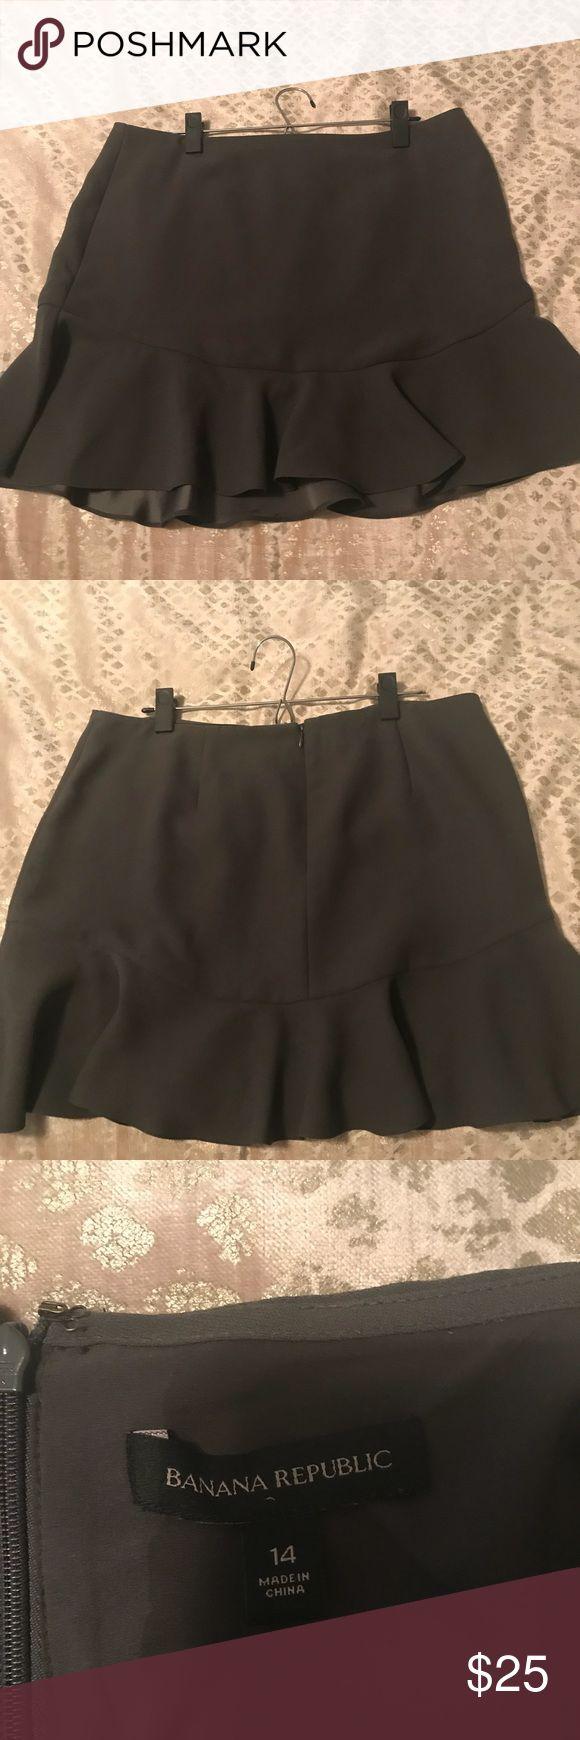 Banana Republic Olive Peplum Skirt Mid length Olive peplum skirt. Single zipper closure in back with hook and eye. Banana Republic Skirts Midi